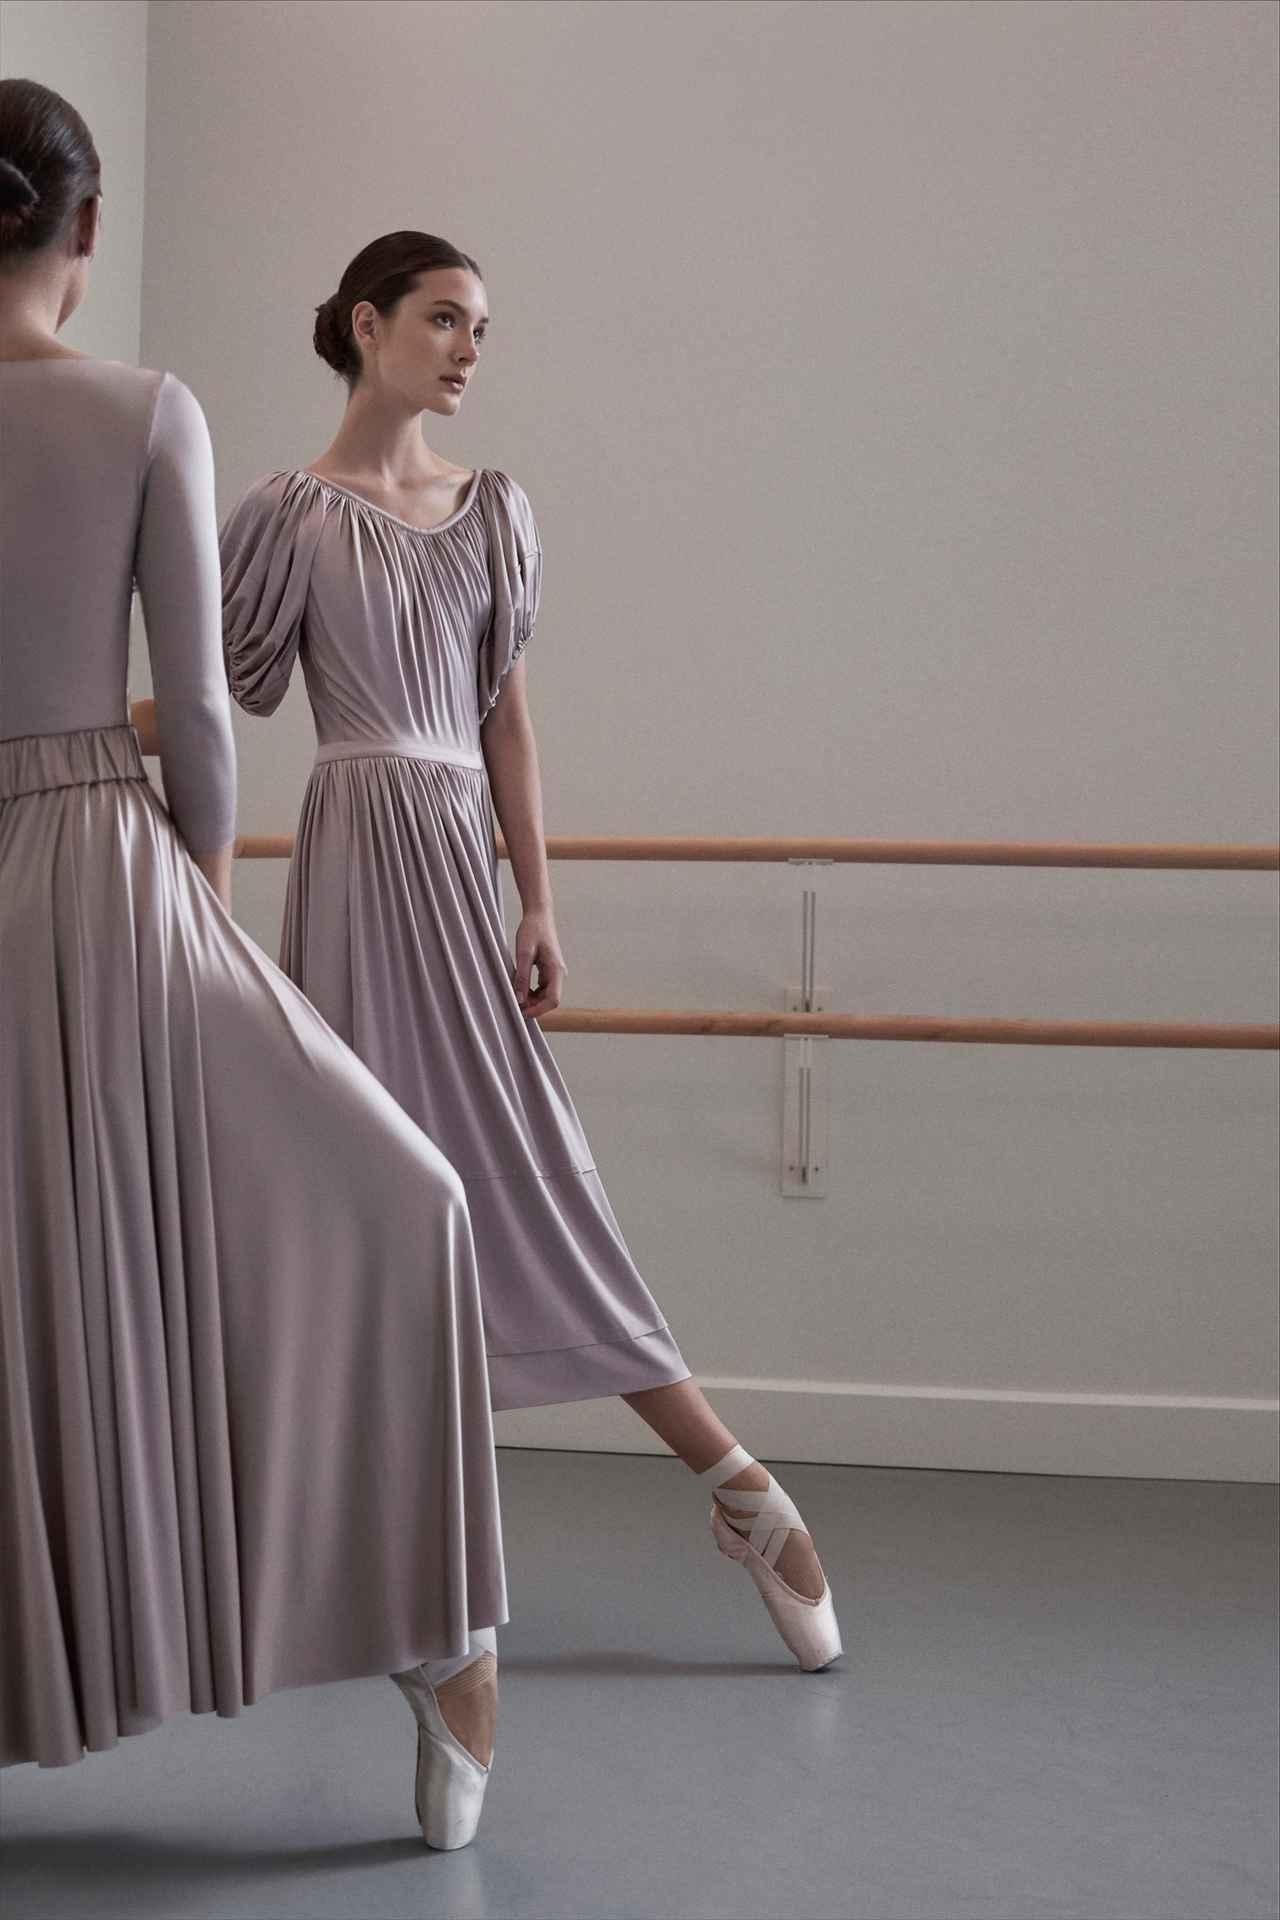 Images : 4番目の画像 - 「ドレス自由自在<Vol.2> 新しい才能が花盛り。 ニュー・ドレス時代到来」のアルバム - T JAPAN:The New York Times Style Magazine 公式サイト